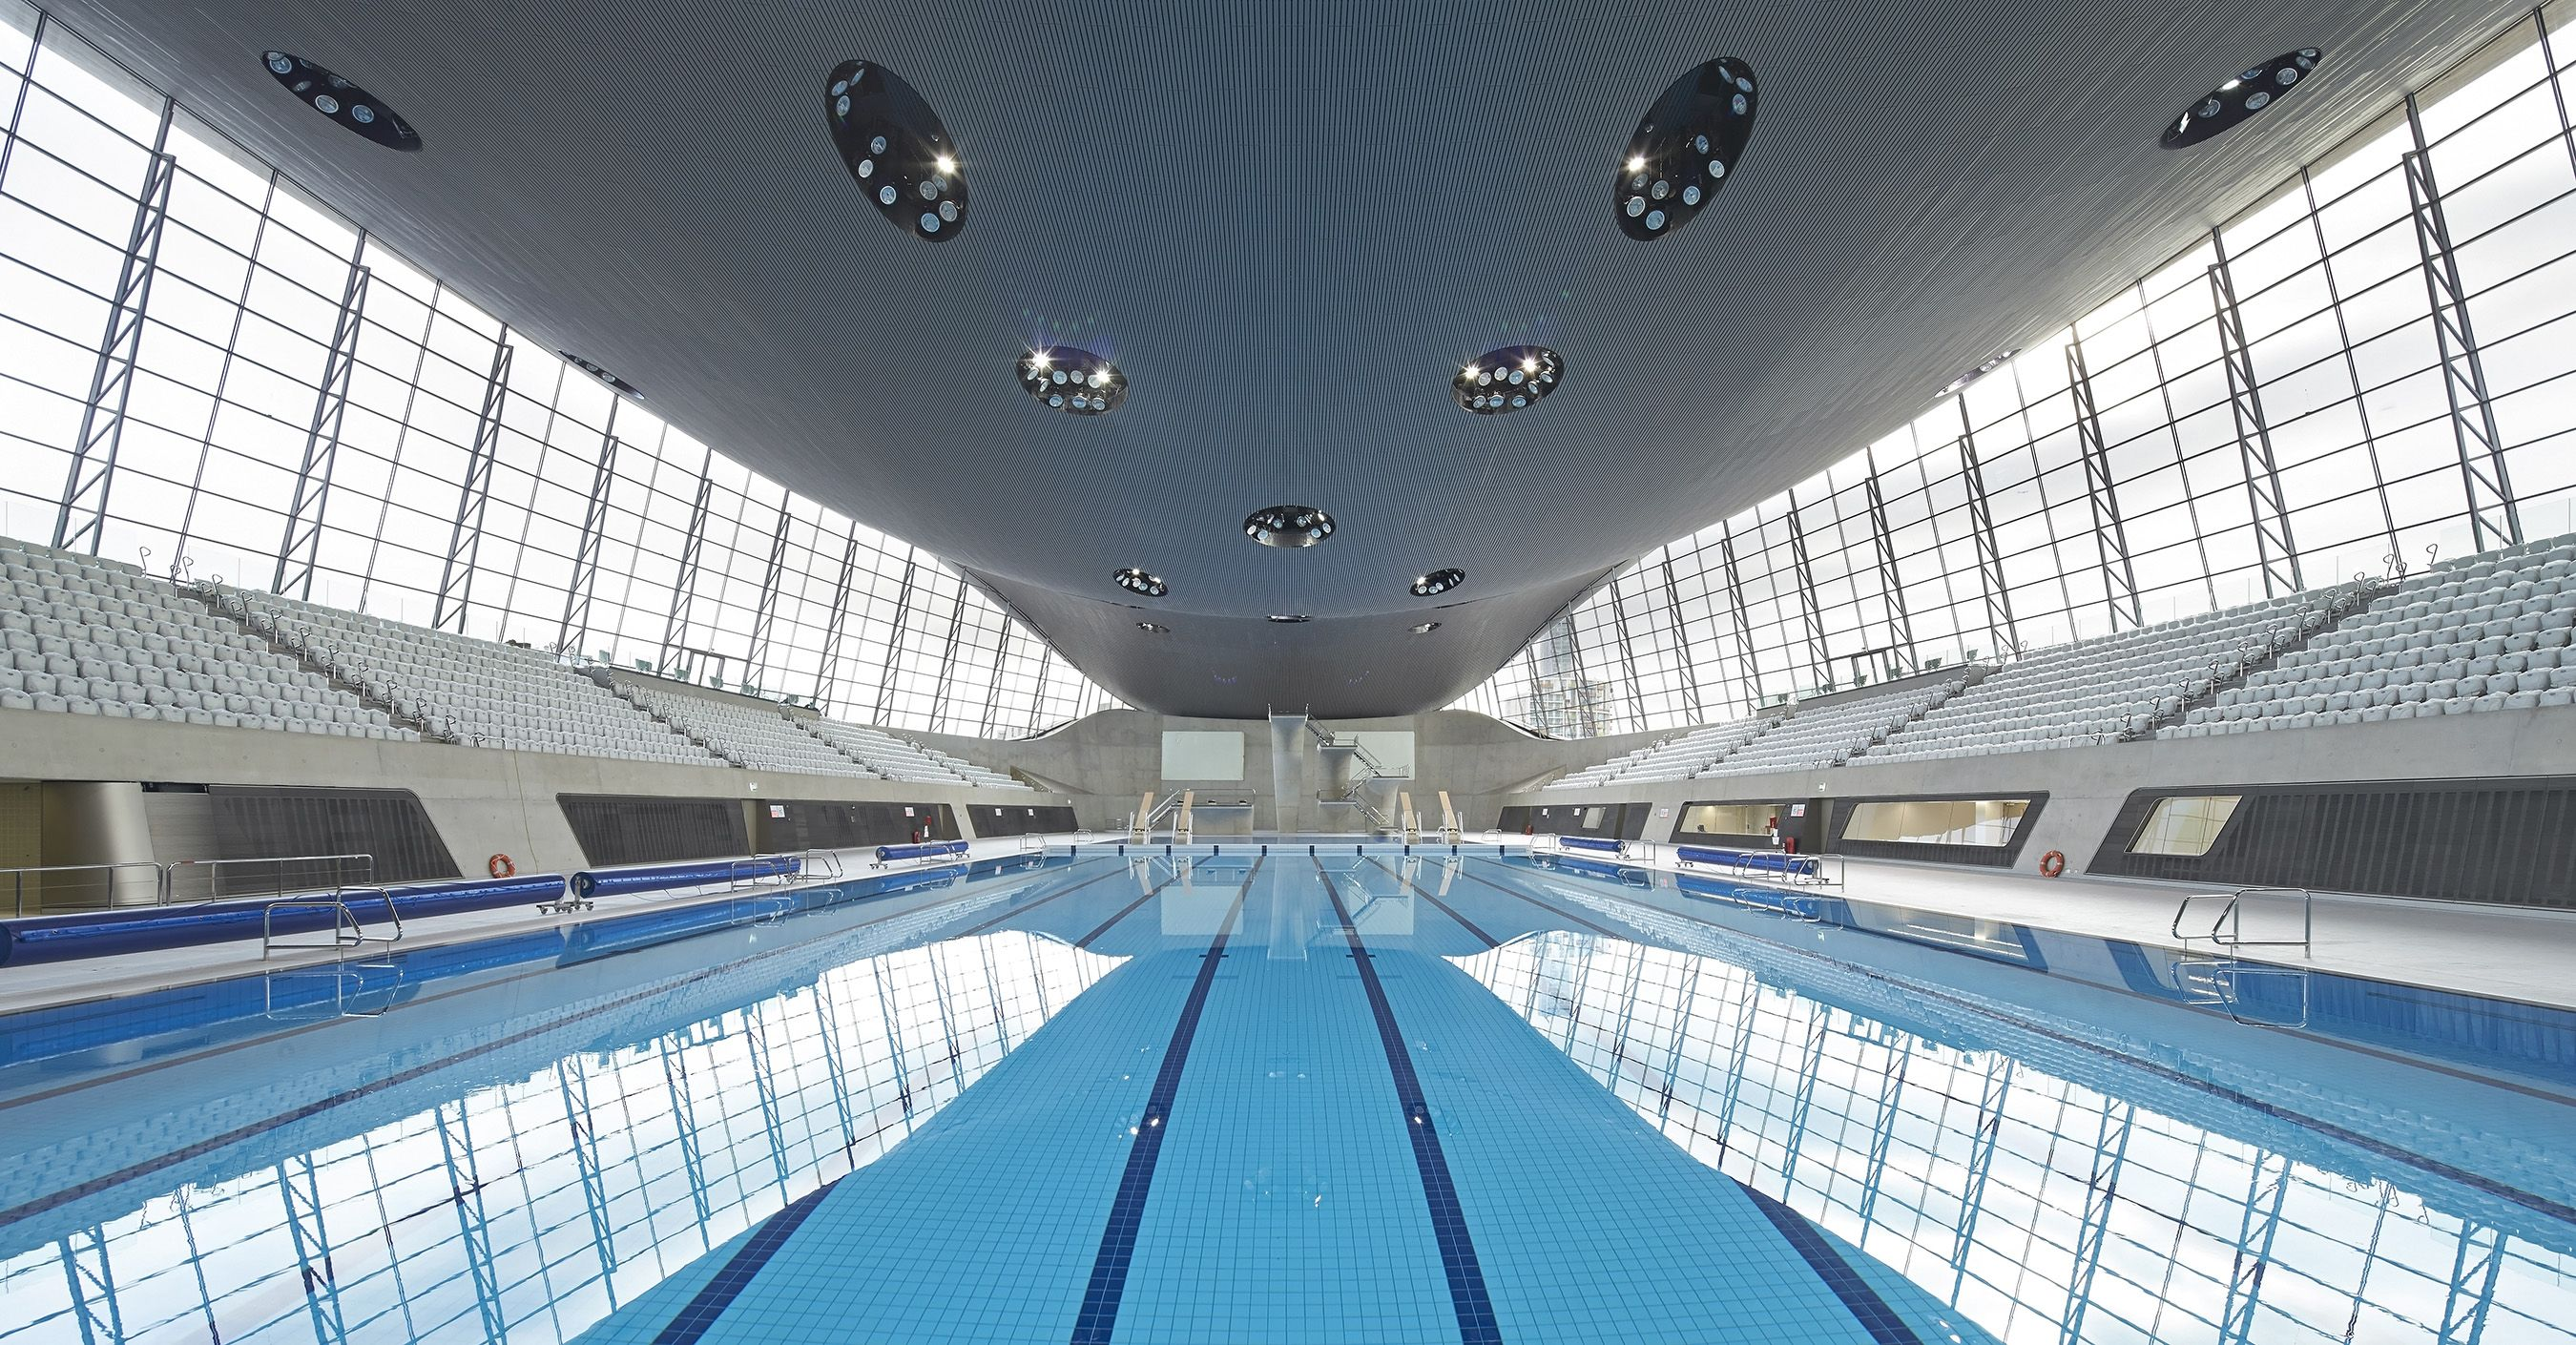 Zaha hadid olympic legacy design london aquatics centre for Pool design london